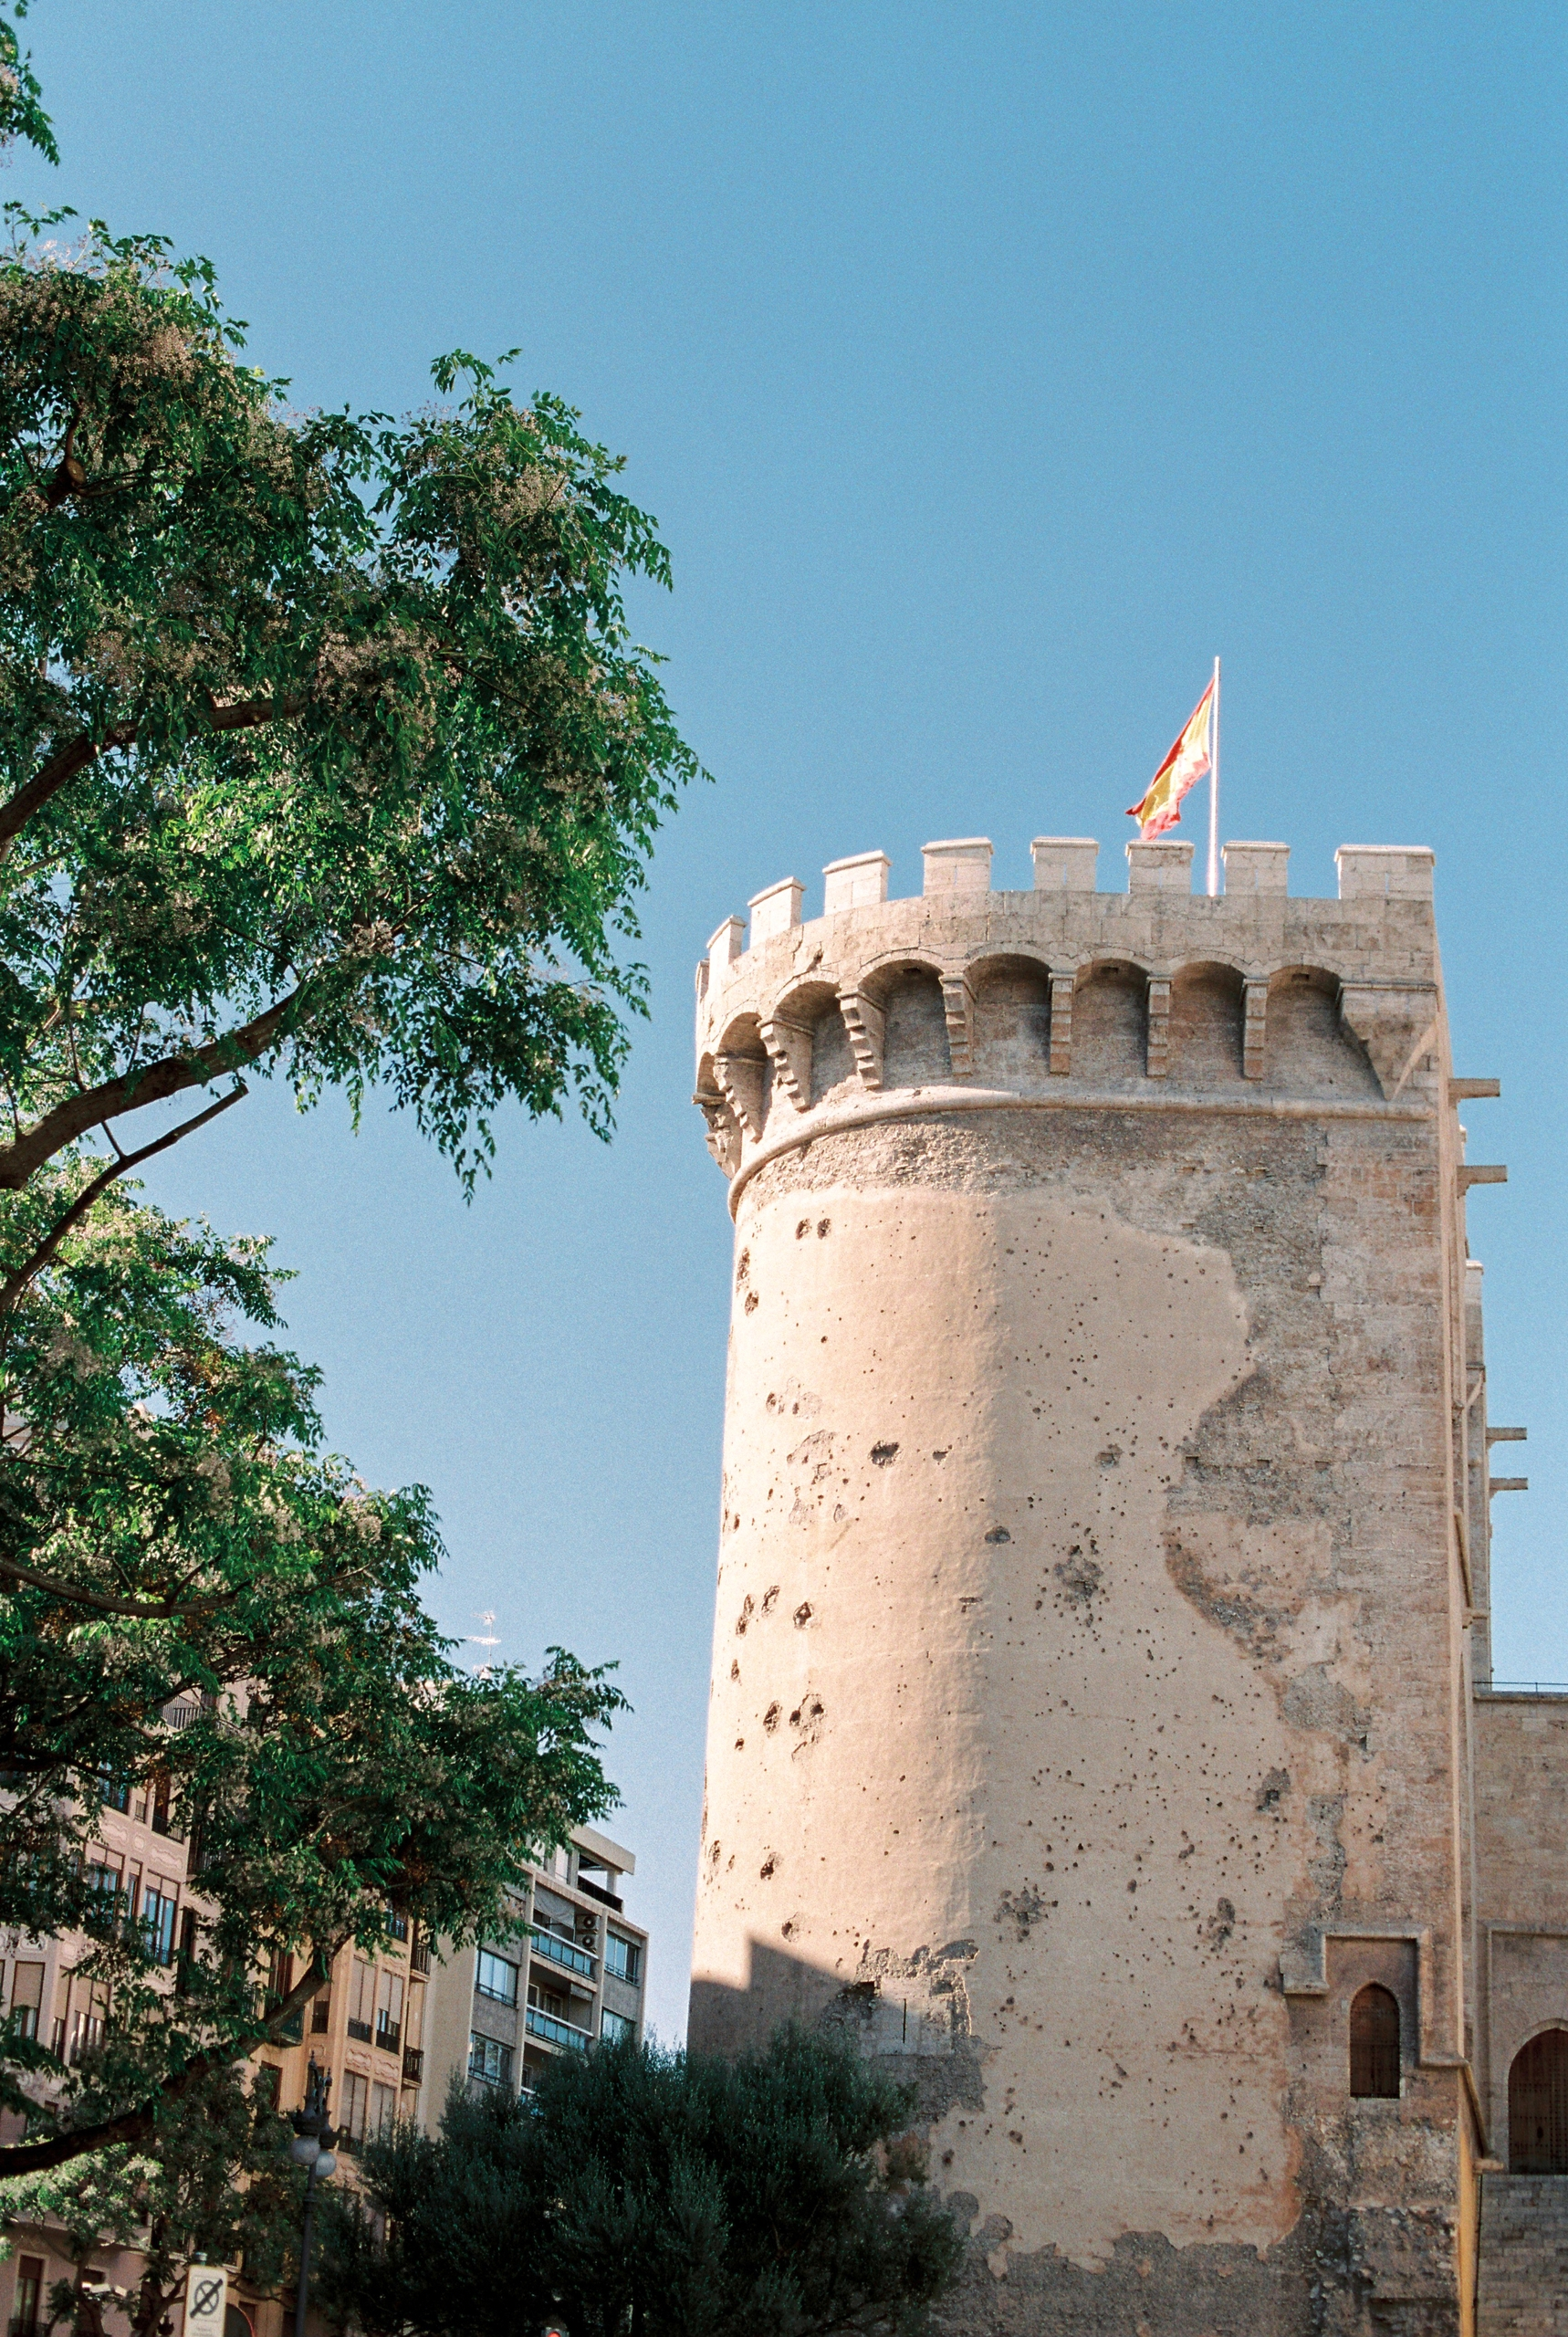 Spain takes forts Shot Canon 1v - michelleamock | ello